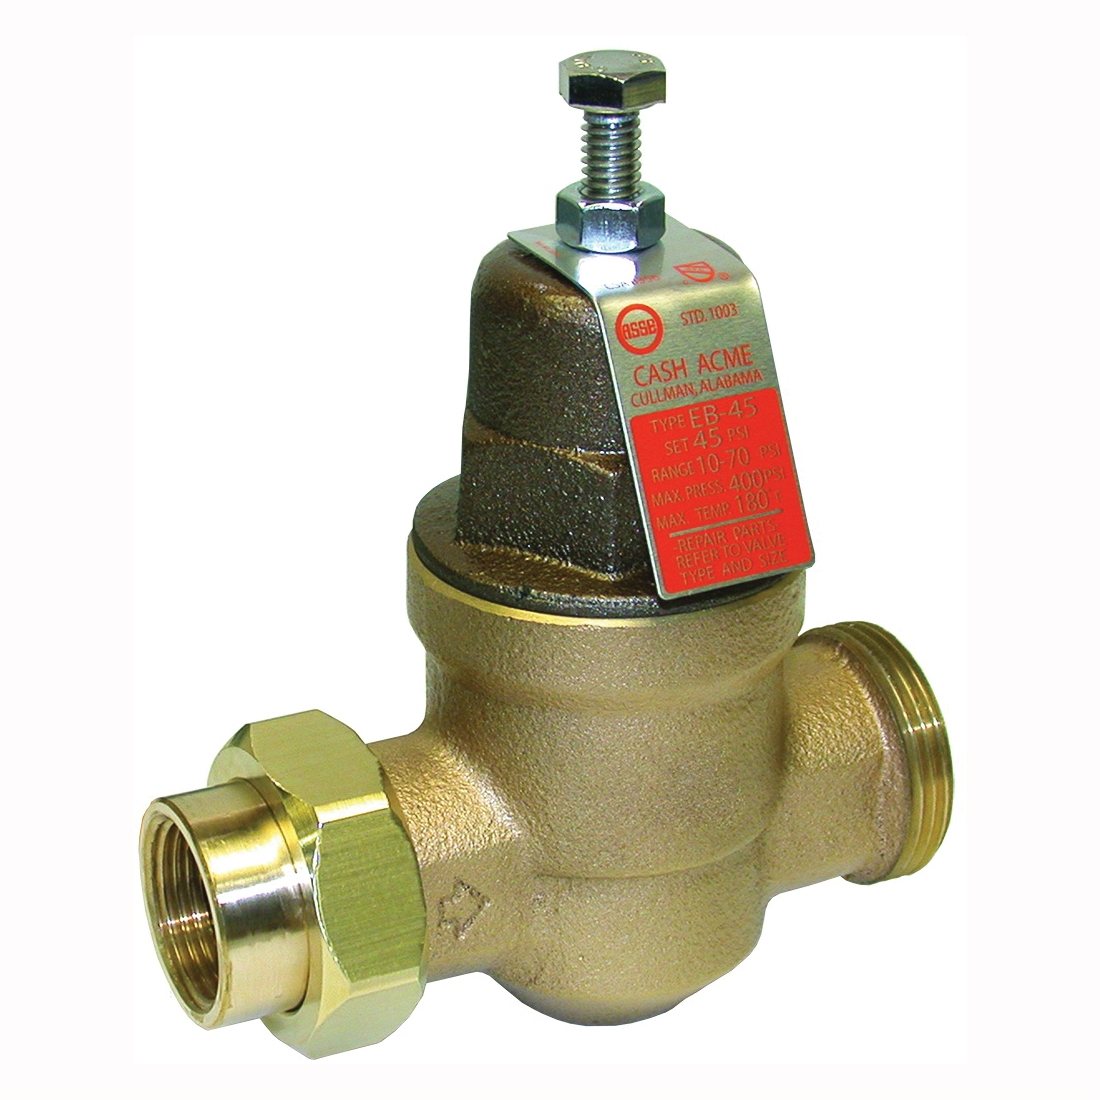 Picture of SharkBite EB45 Series 23882-0045 Pressure Regulating Valve, 1/2 in Connection, Single Union x NPT, Bronze Body